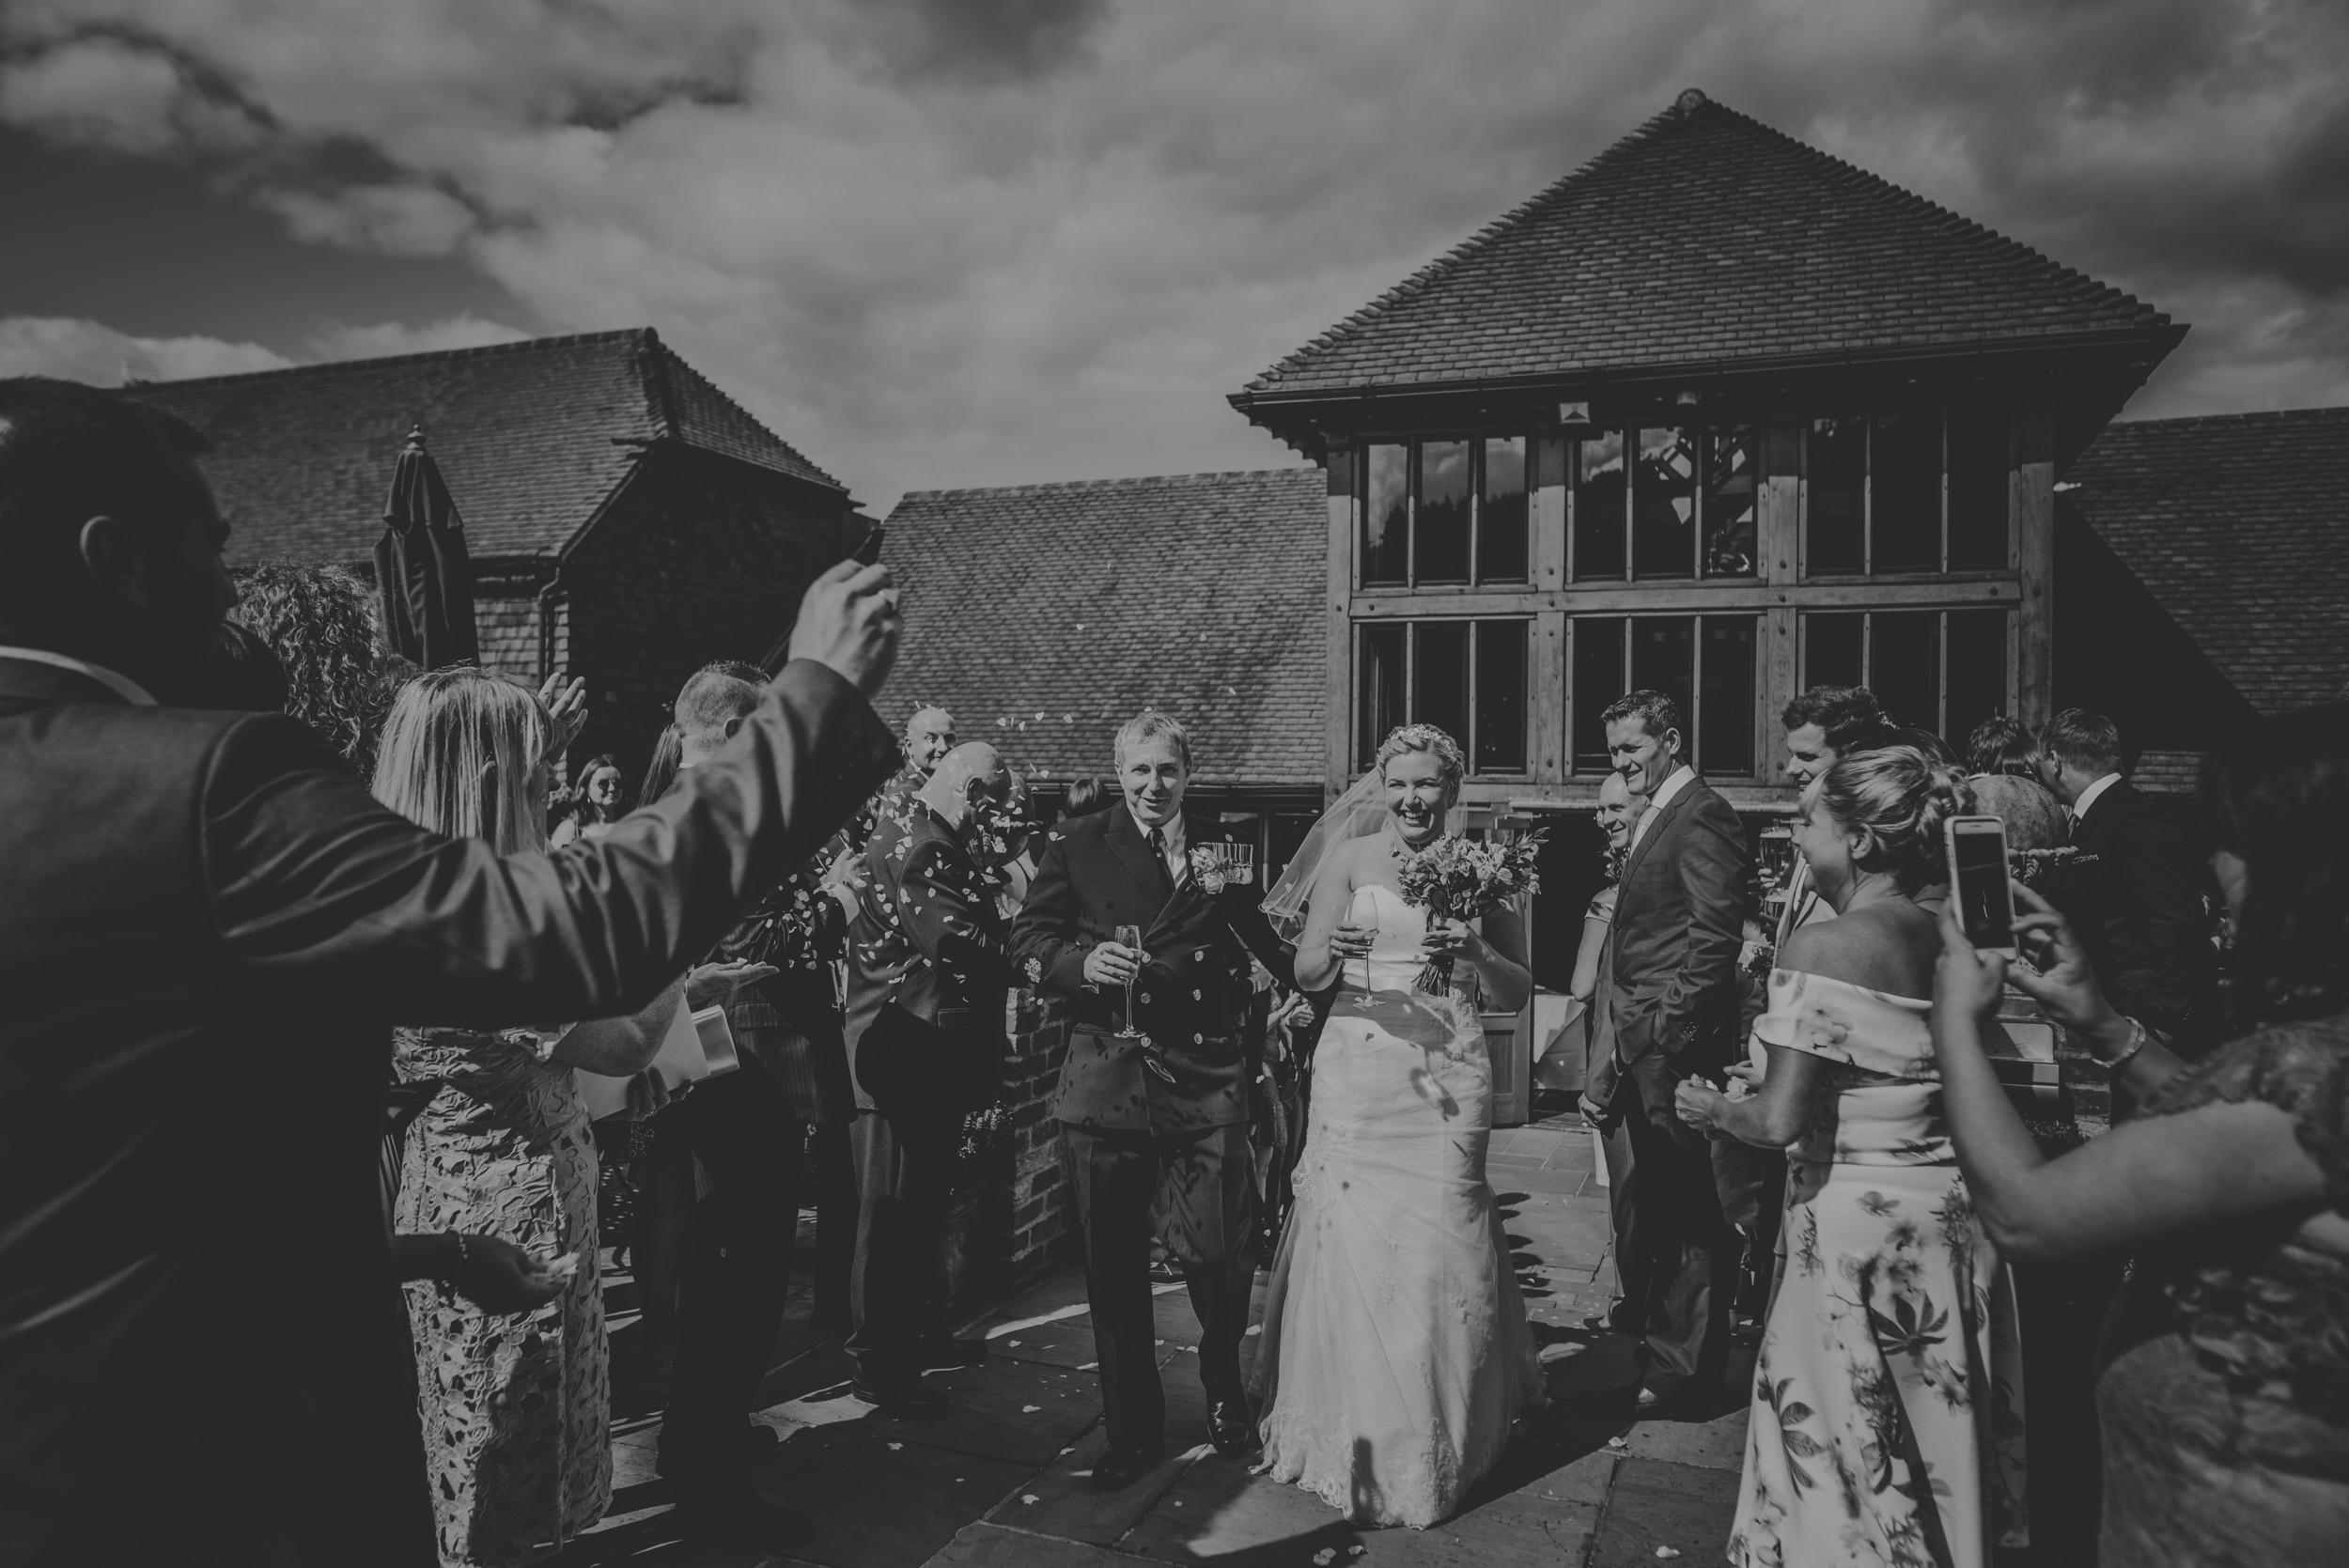 Chantelle-and-Stephen-Old-Thorns-Hotel-Wedding-Liphook-Manu-Mendoza-Wedding-Photography-266.jpg